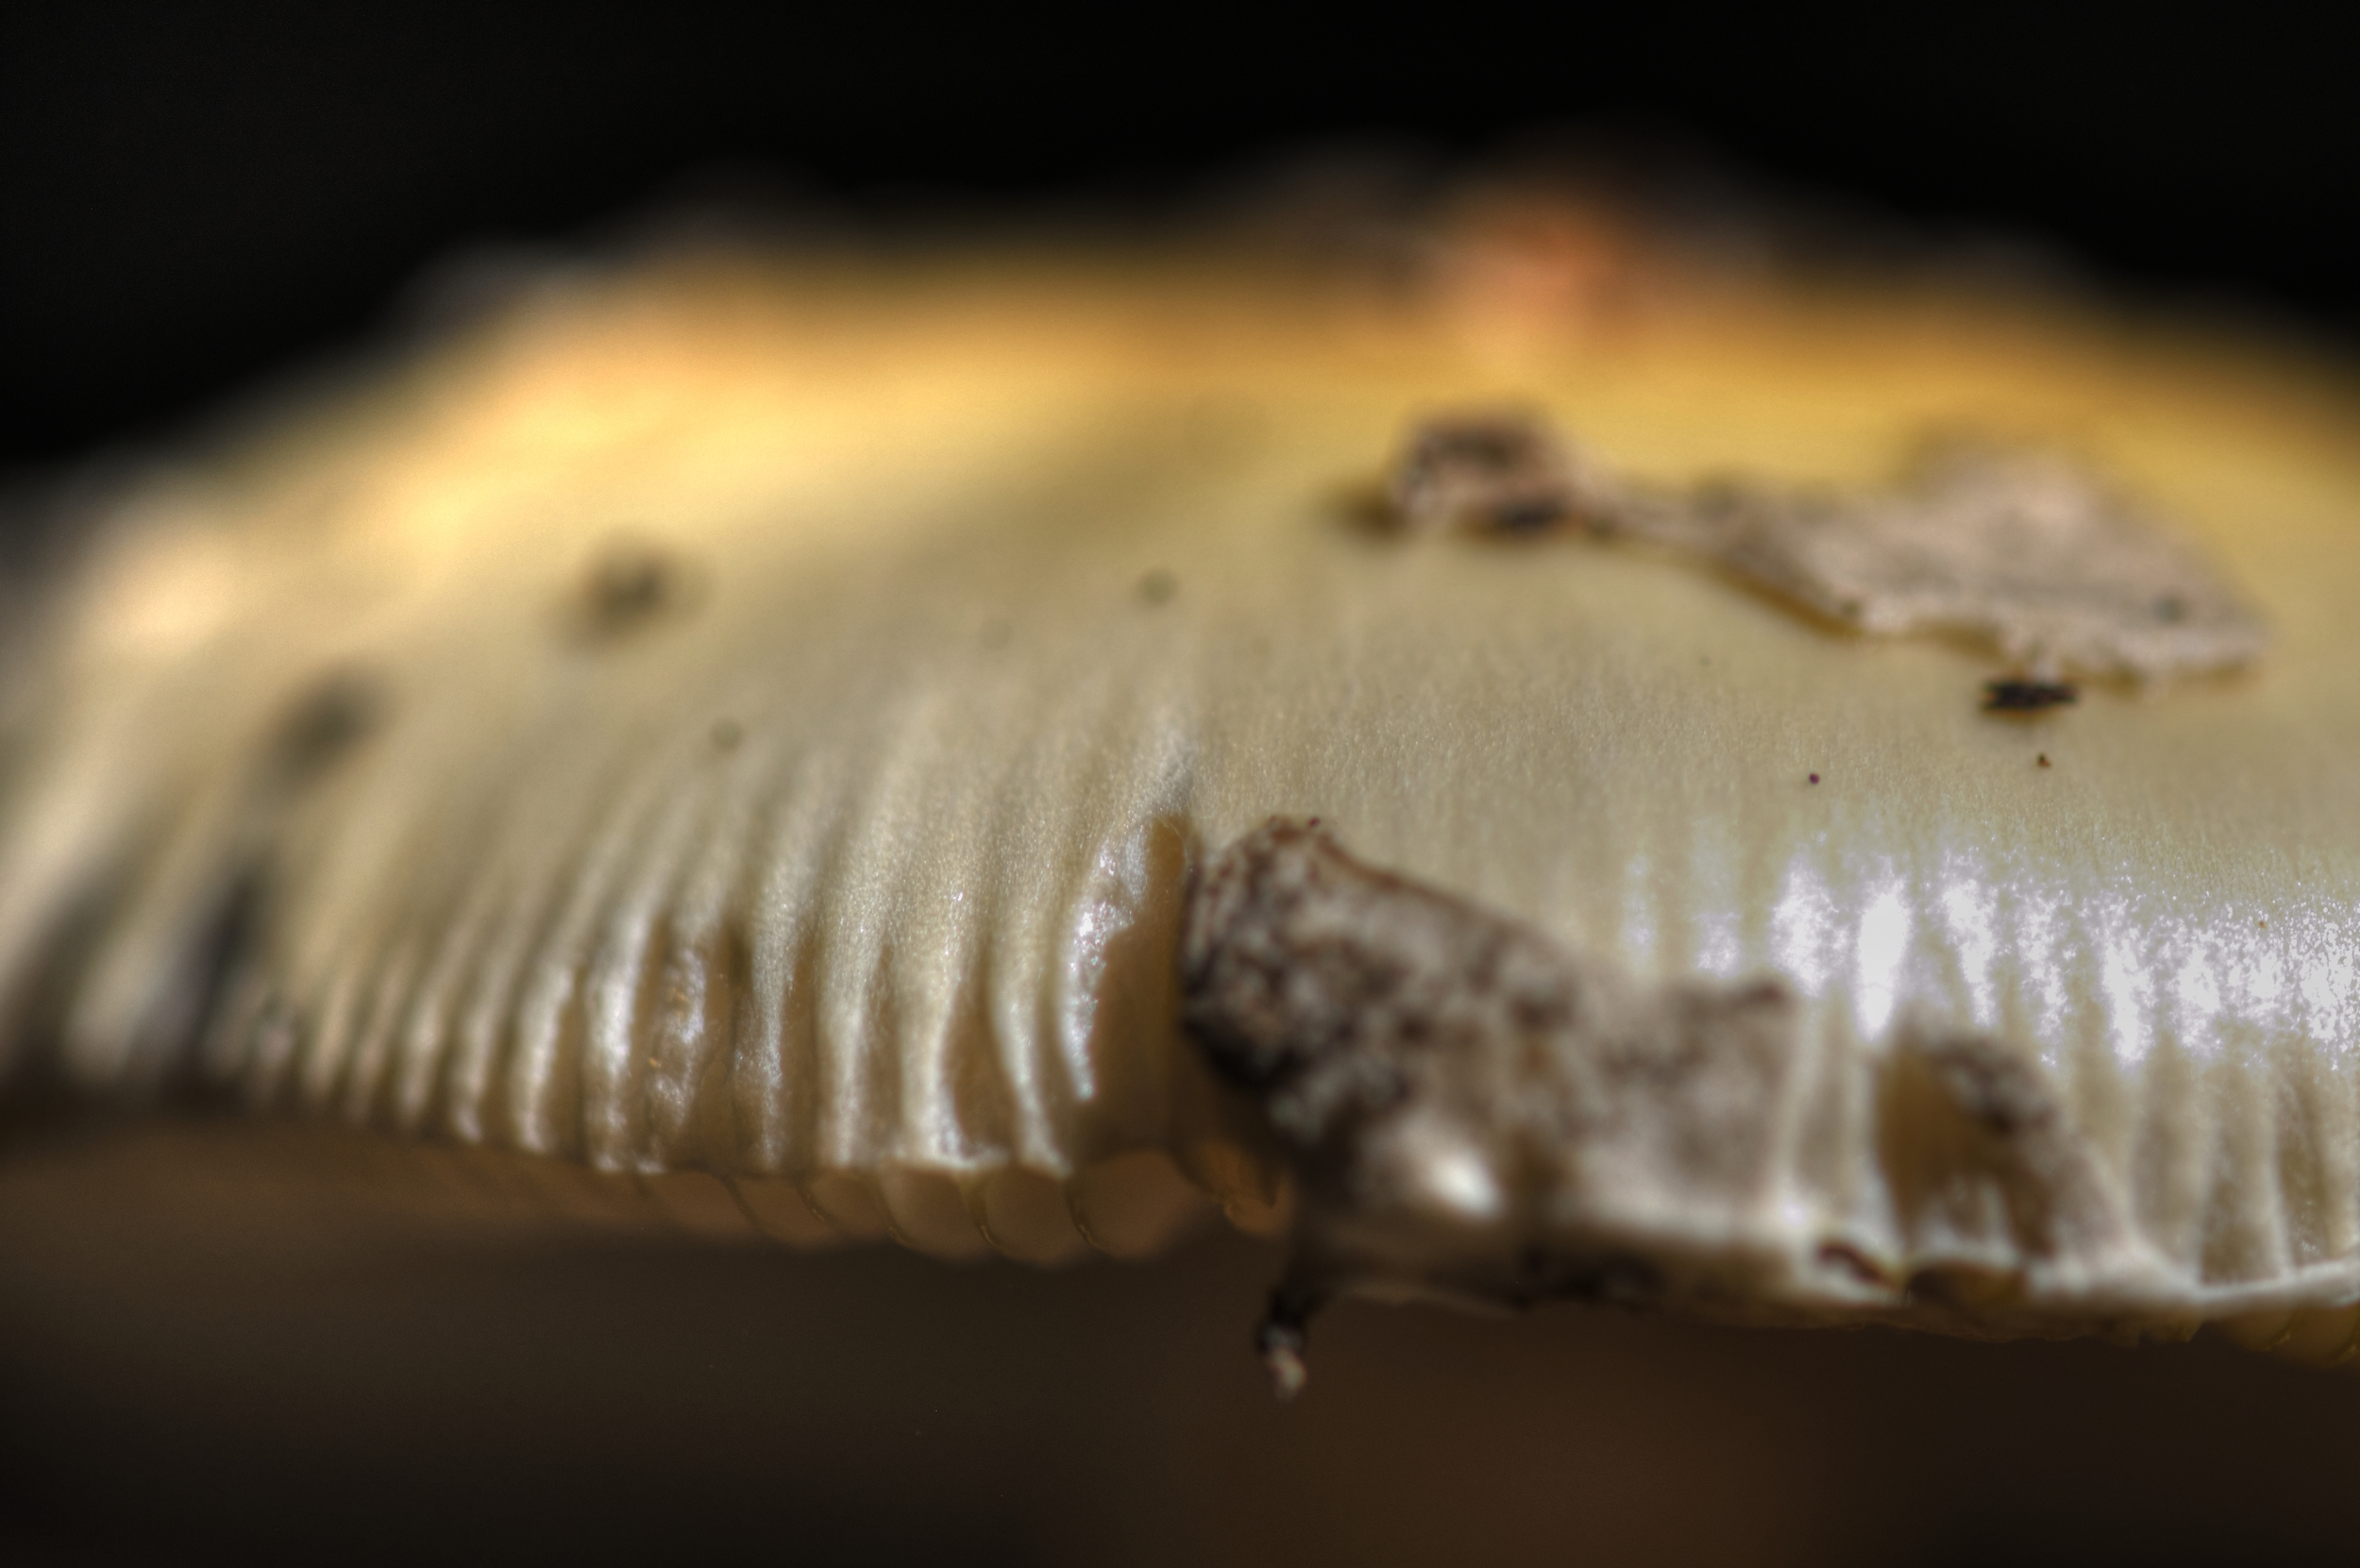 the edge of a mushroom in Hamlin park 2013